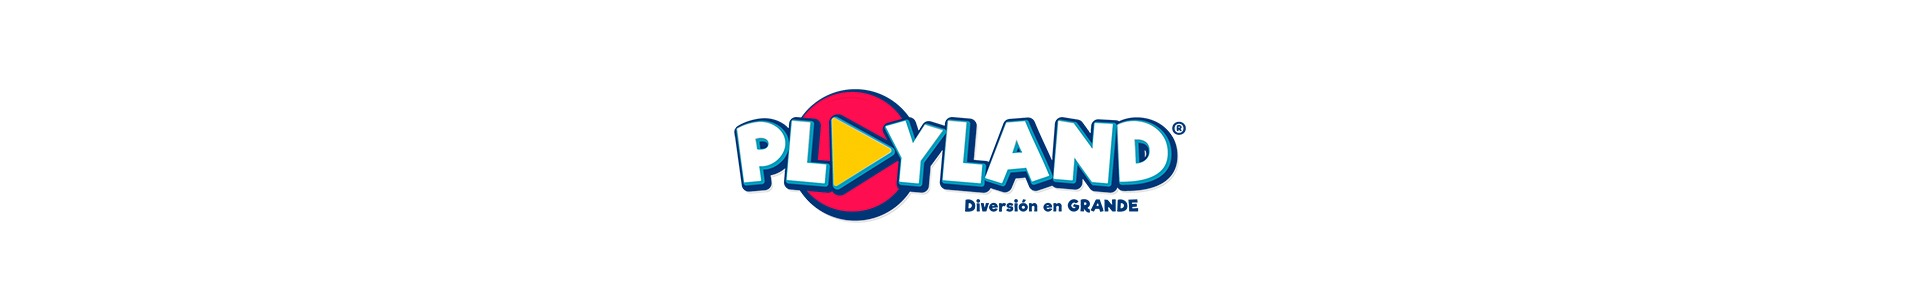 _playland